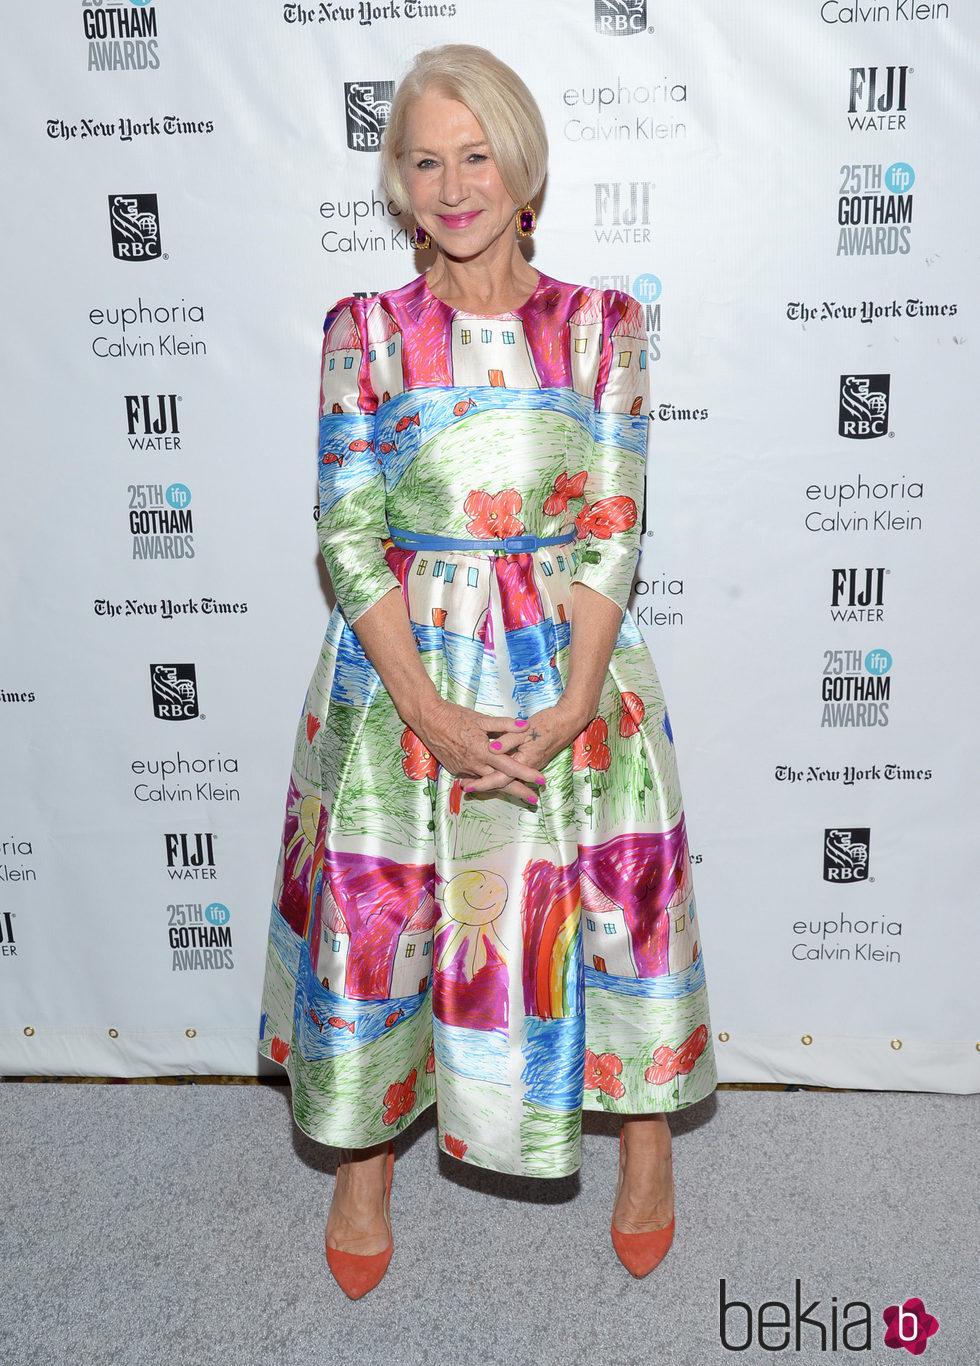 Helen Mirren en los Premios Gotham 2015